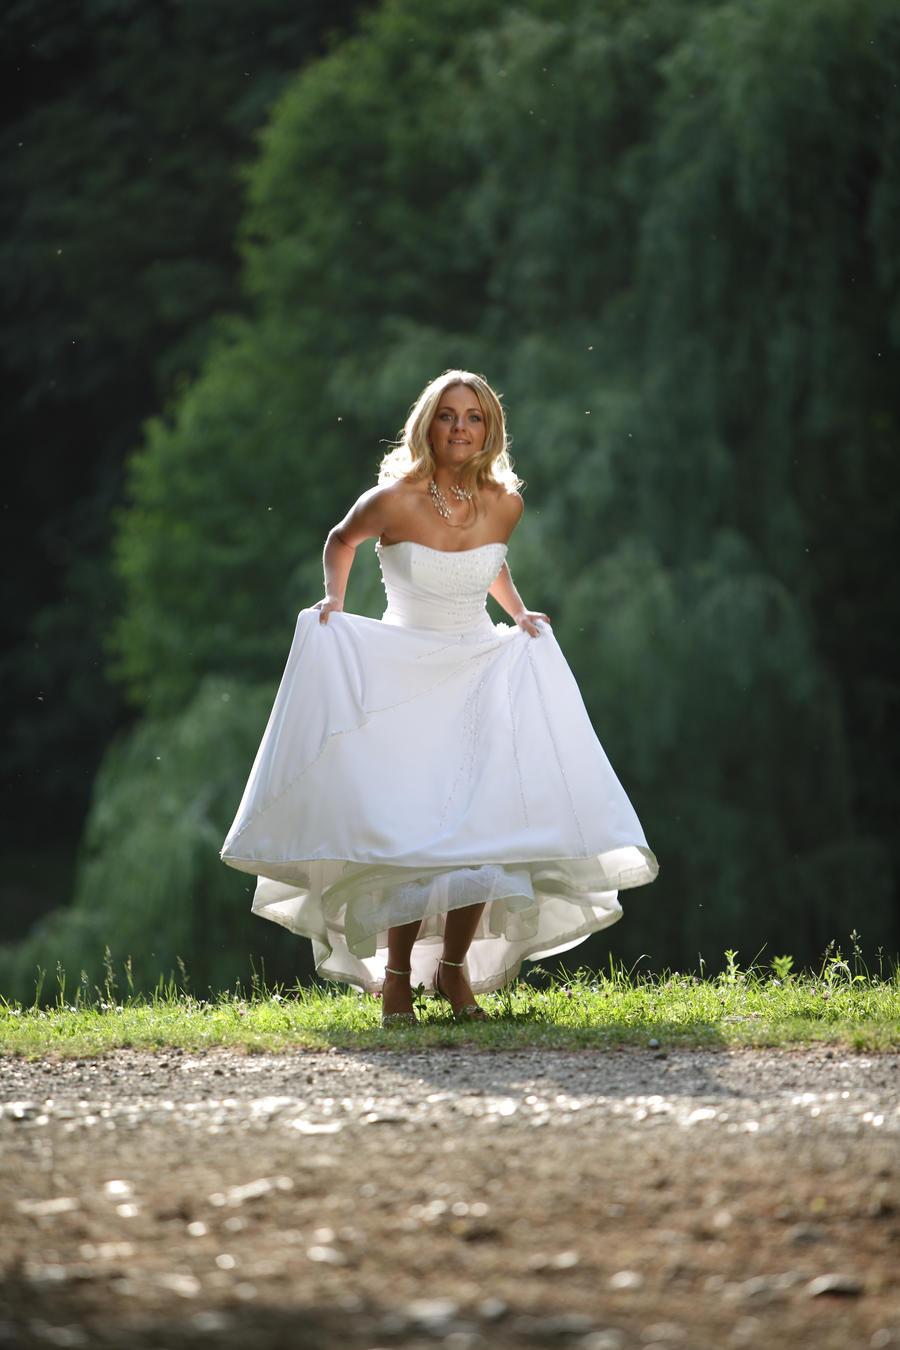 Wedding 11 by Kechake-stock